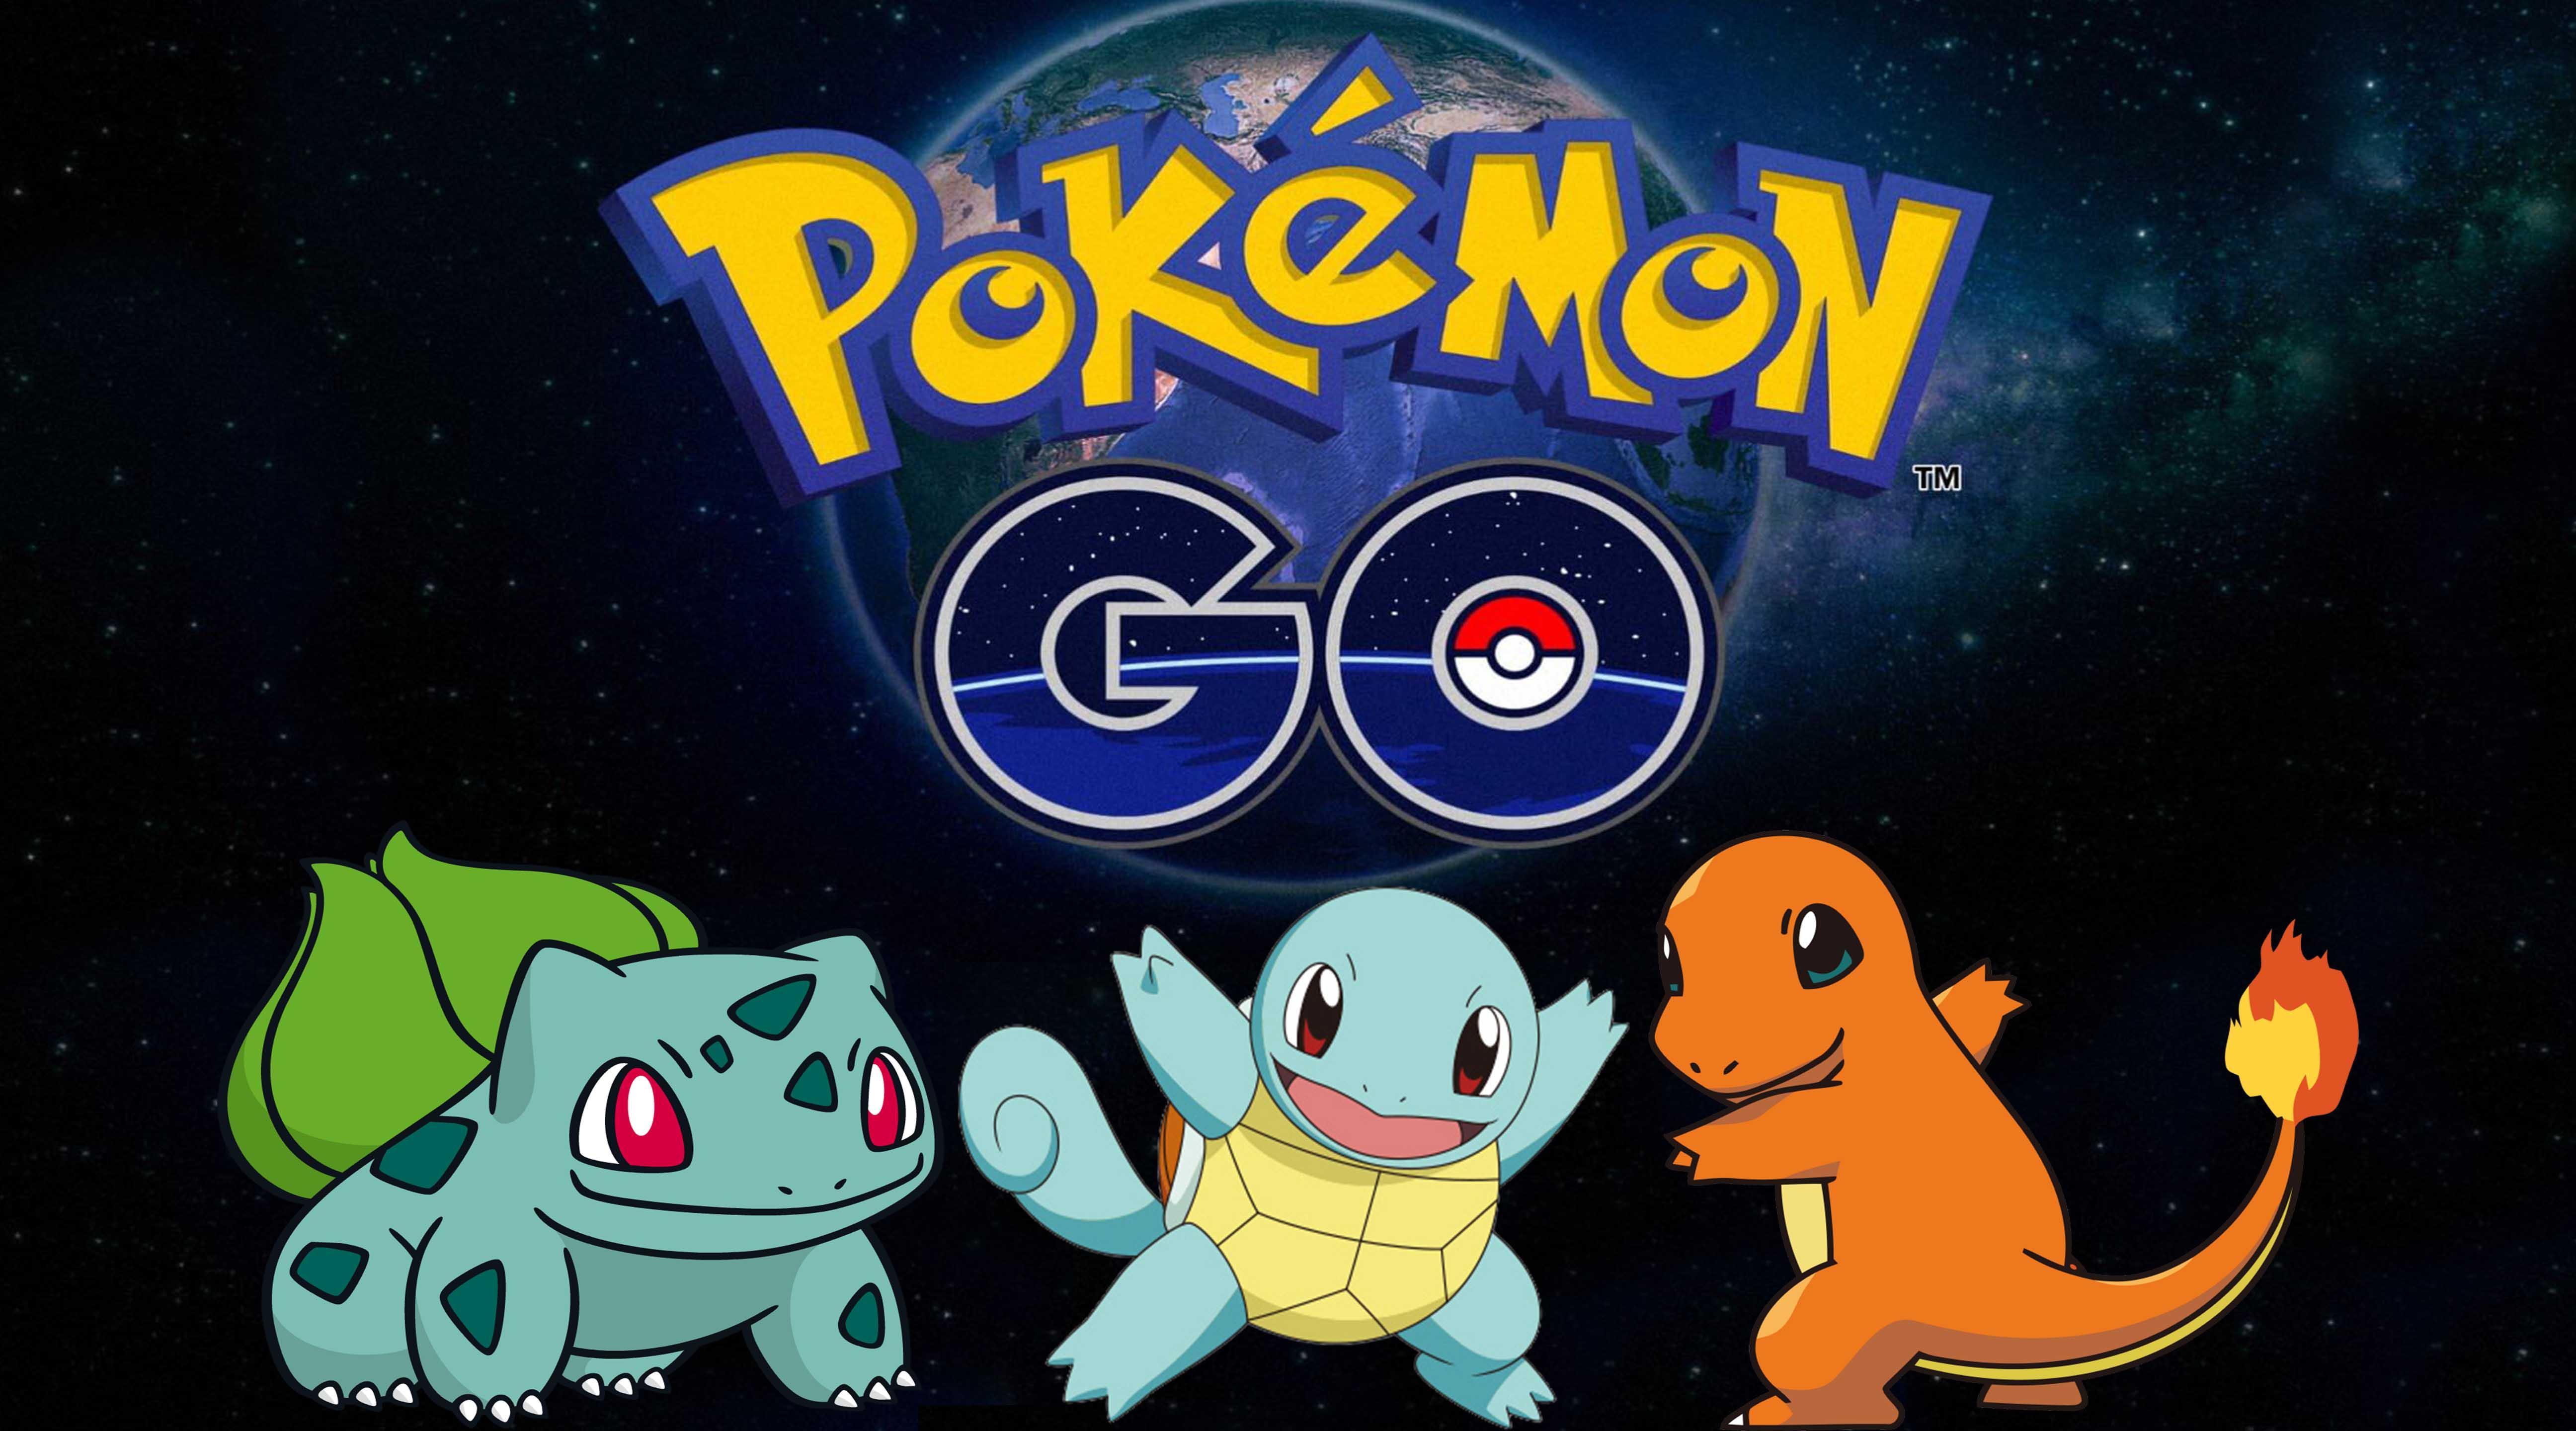 How to play pokemon go on pc with gotcha